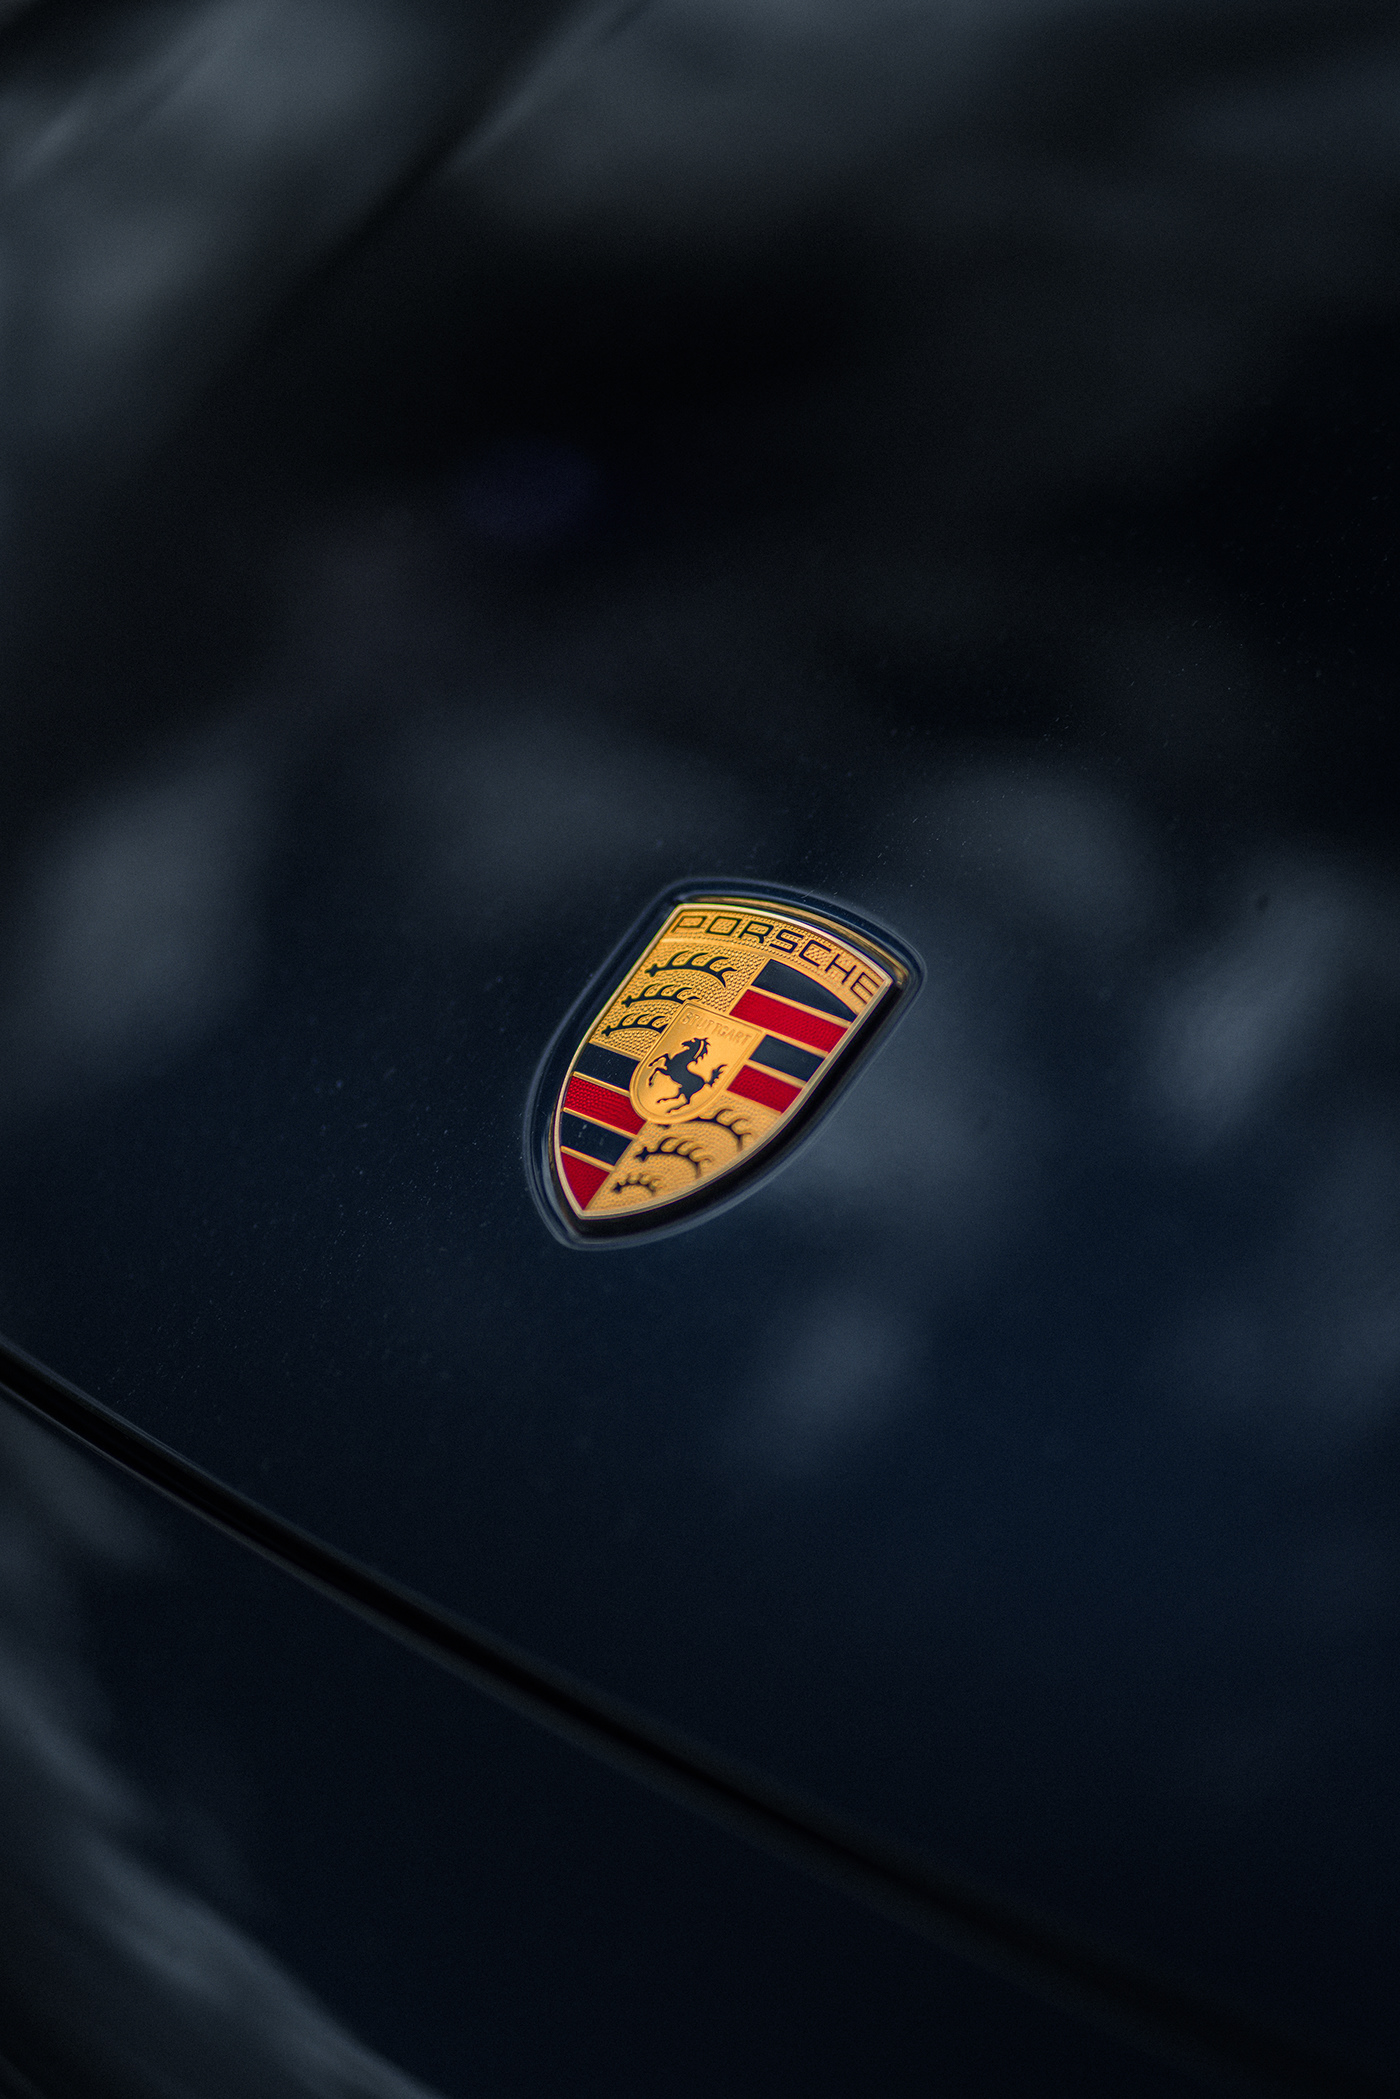 911 carrera automotive   Porsche Porsche 911 Porsche 992 porsche carrera Sportscar